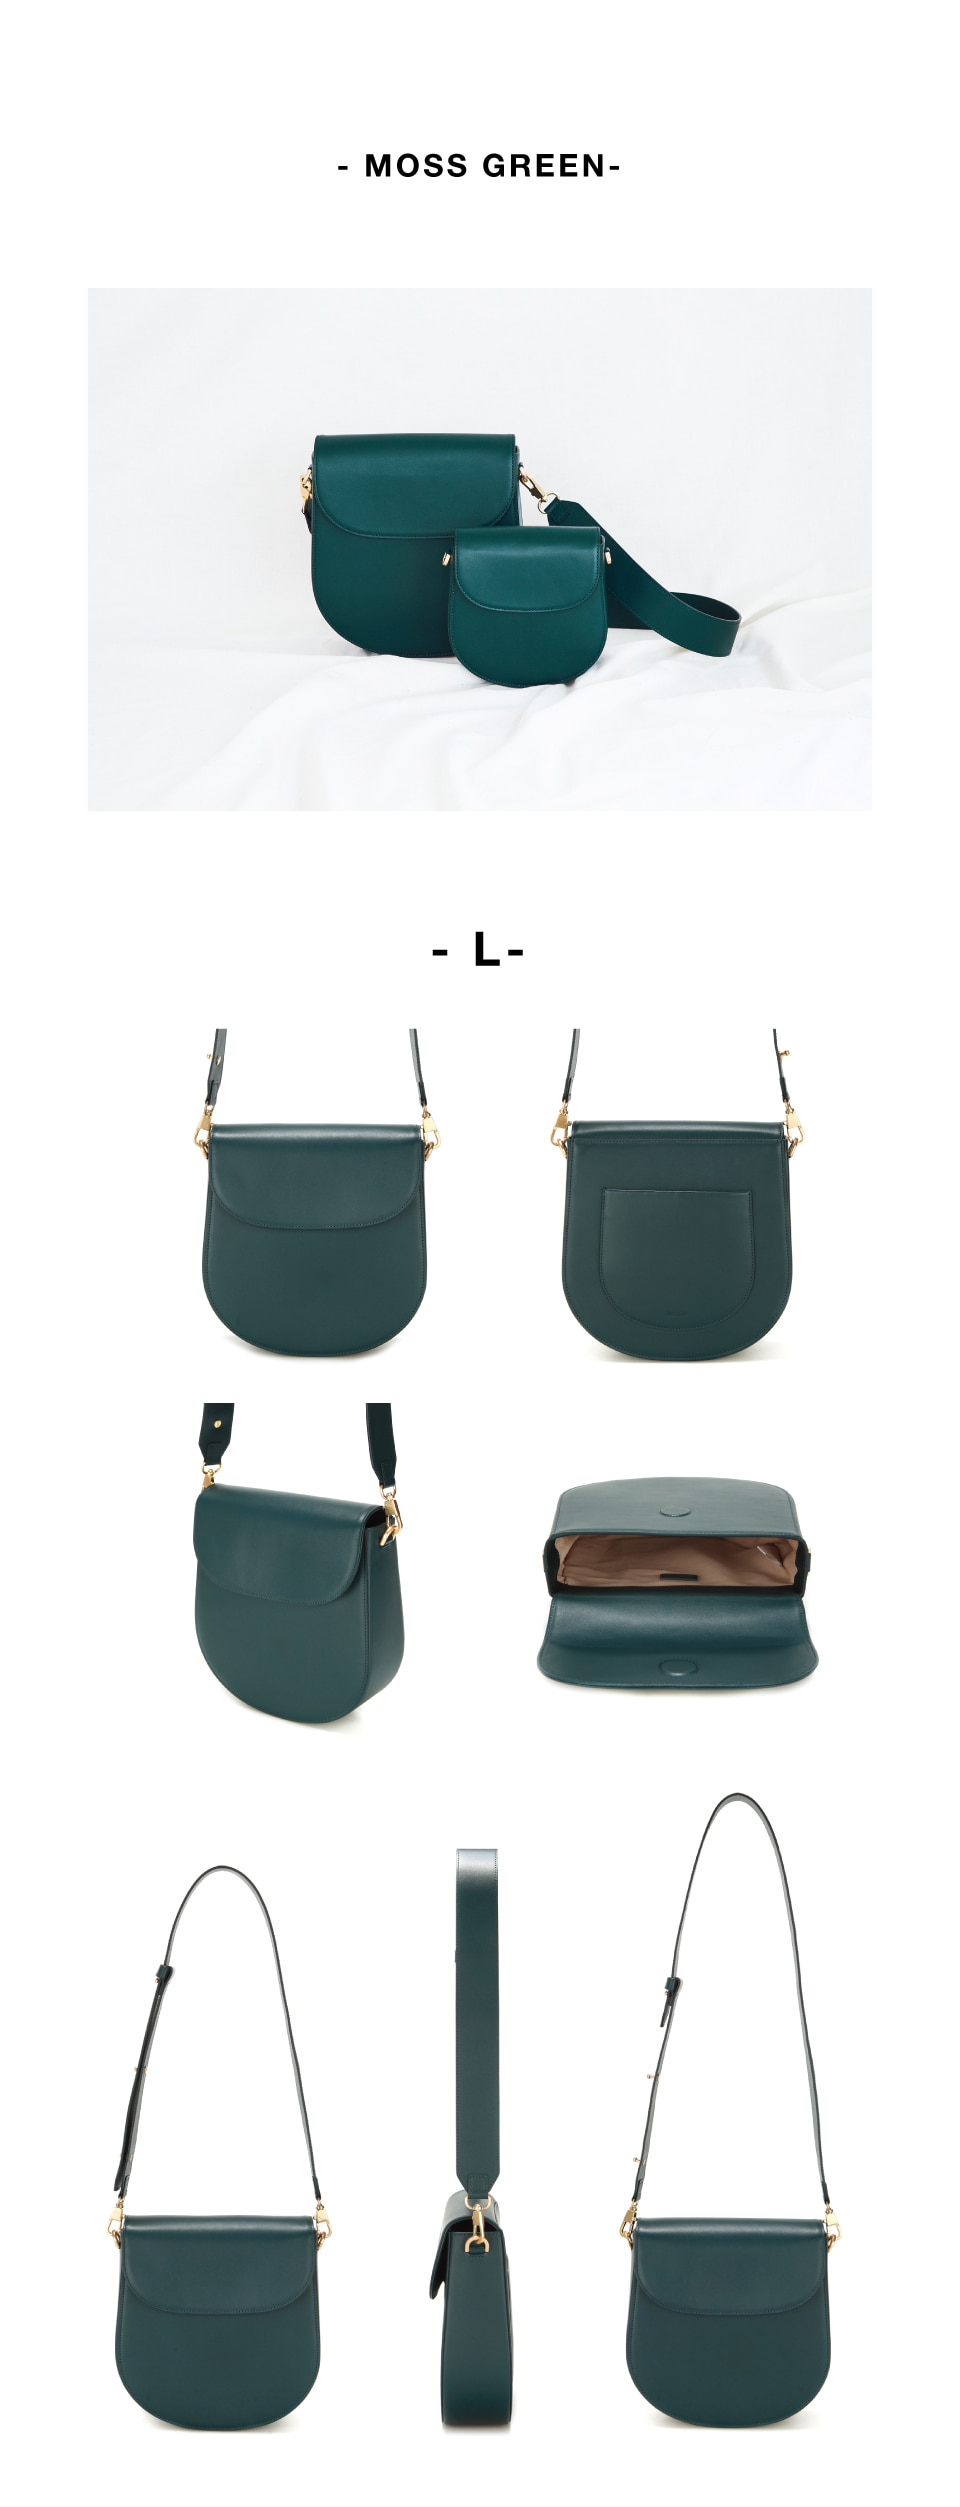 TROIS BAG-L-MOSS GREEN2.jpg